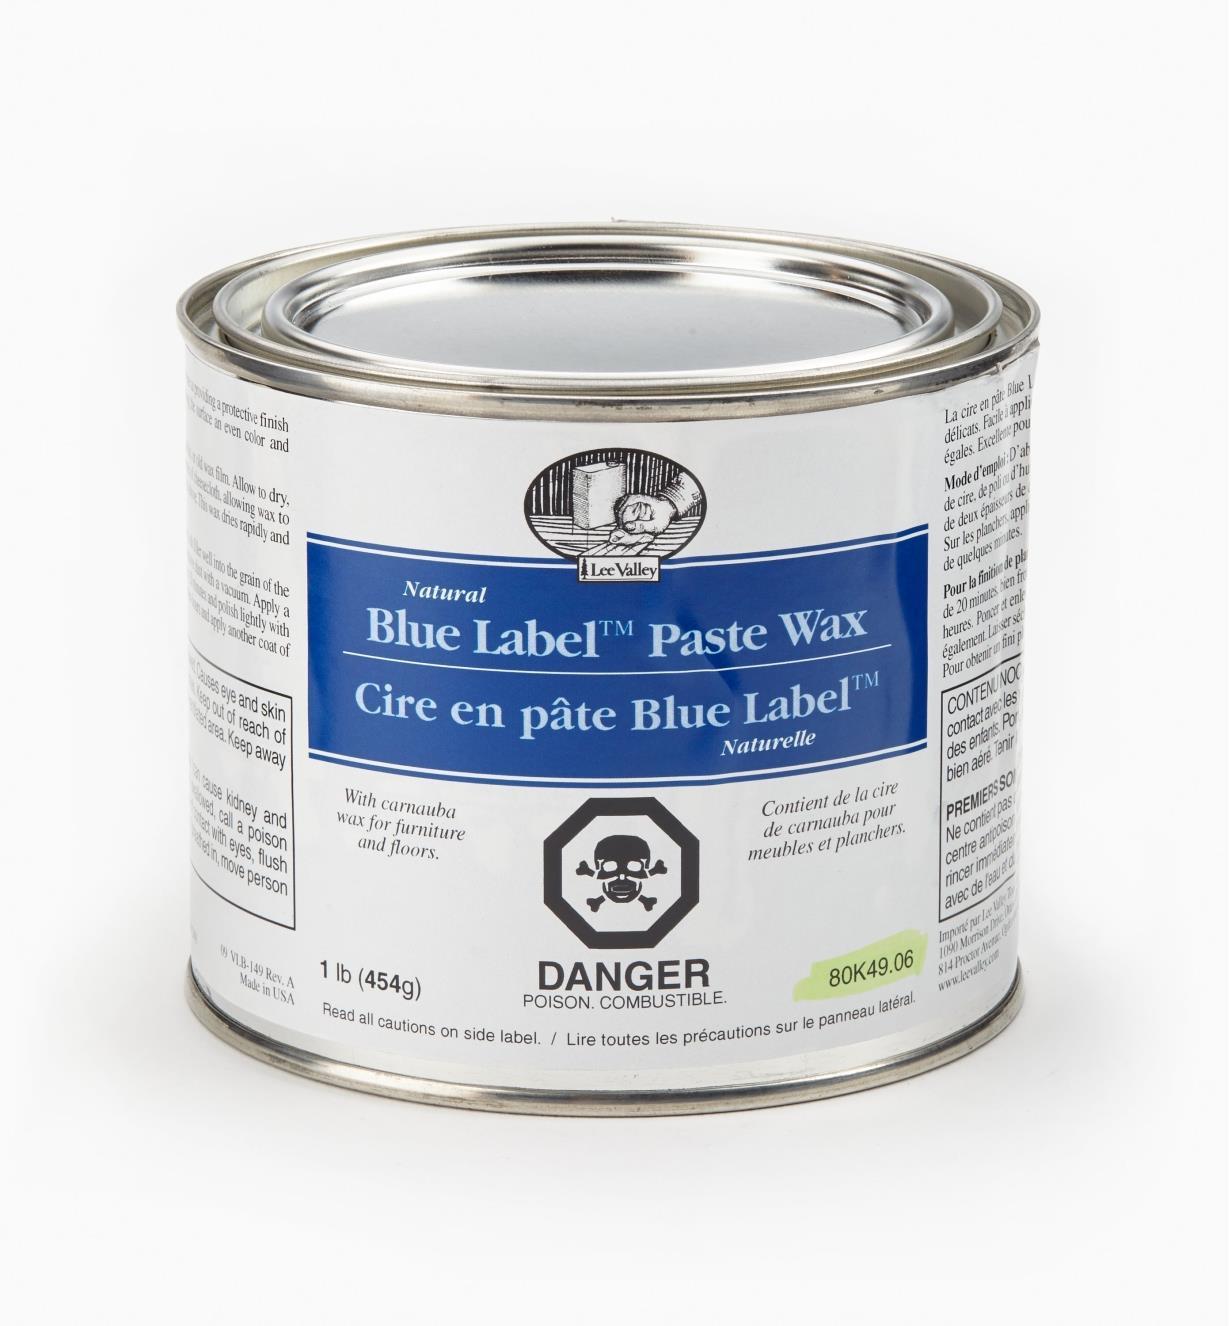 80K4906 - Paste Wax, 1 lb